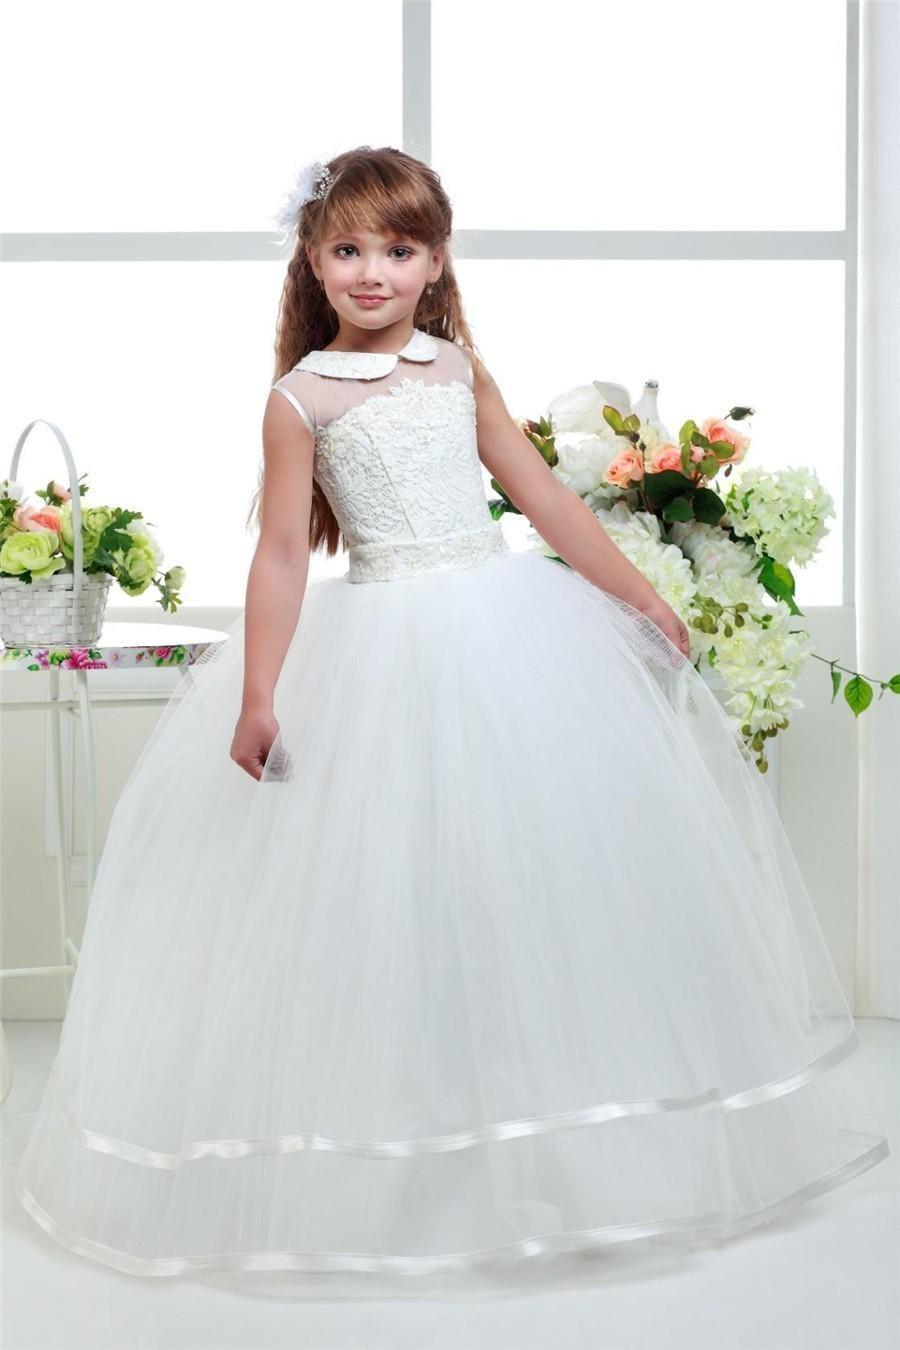 2018 Princess Flower Girls Dresses For Weddings Kids First Communion Dress